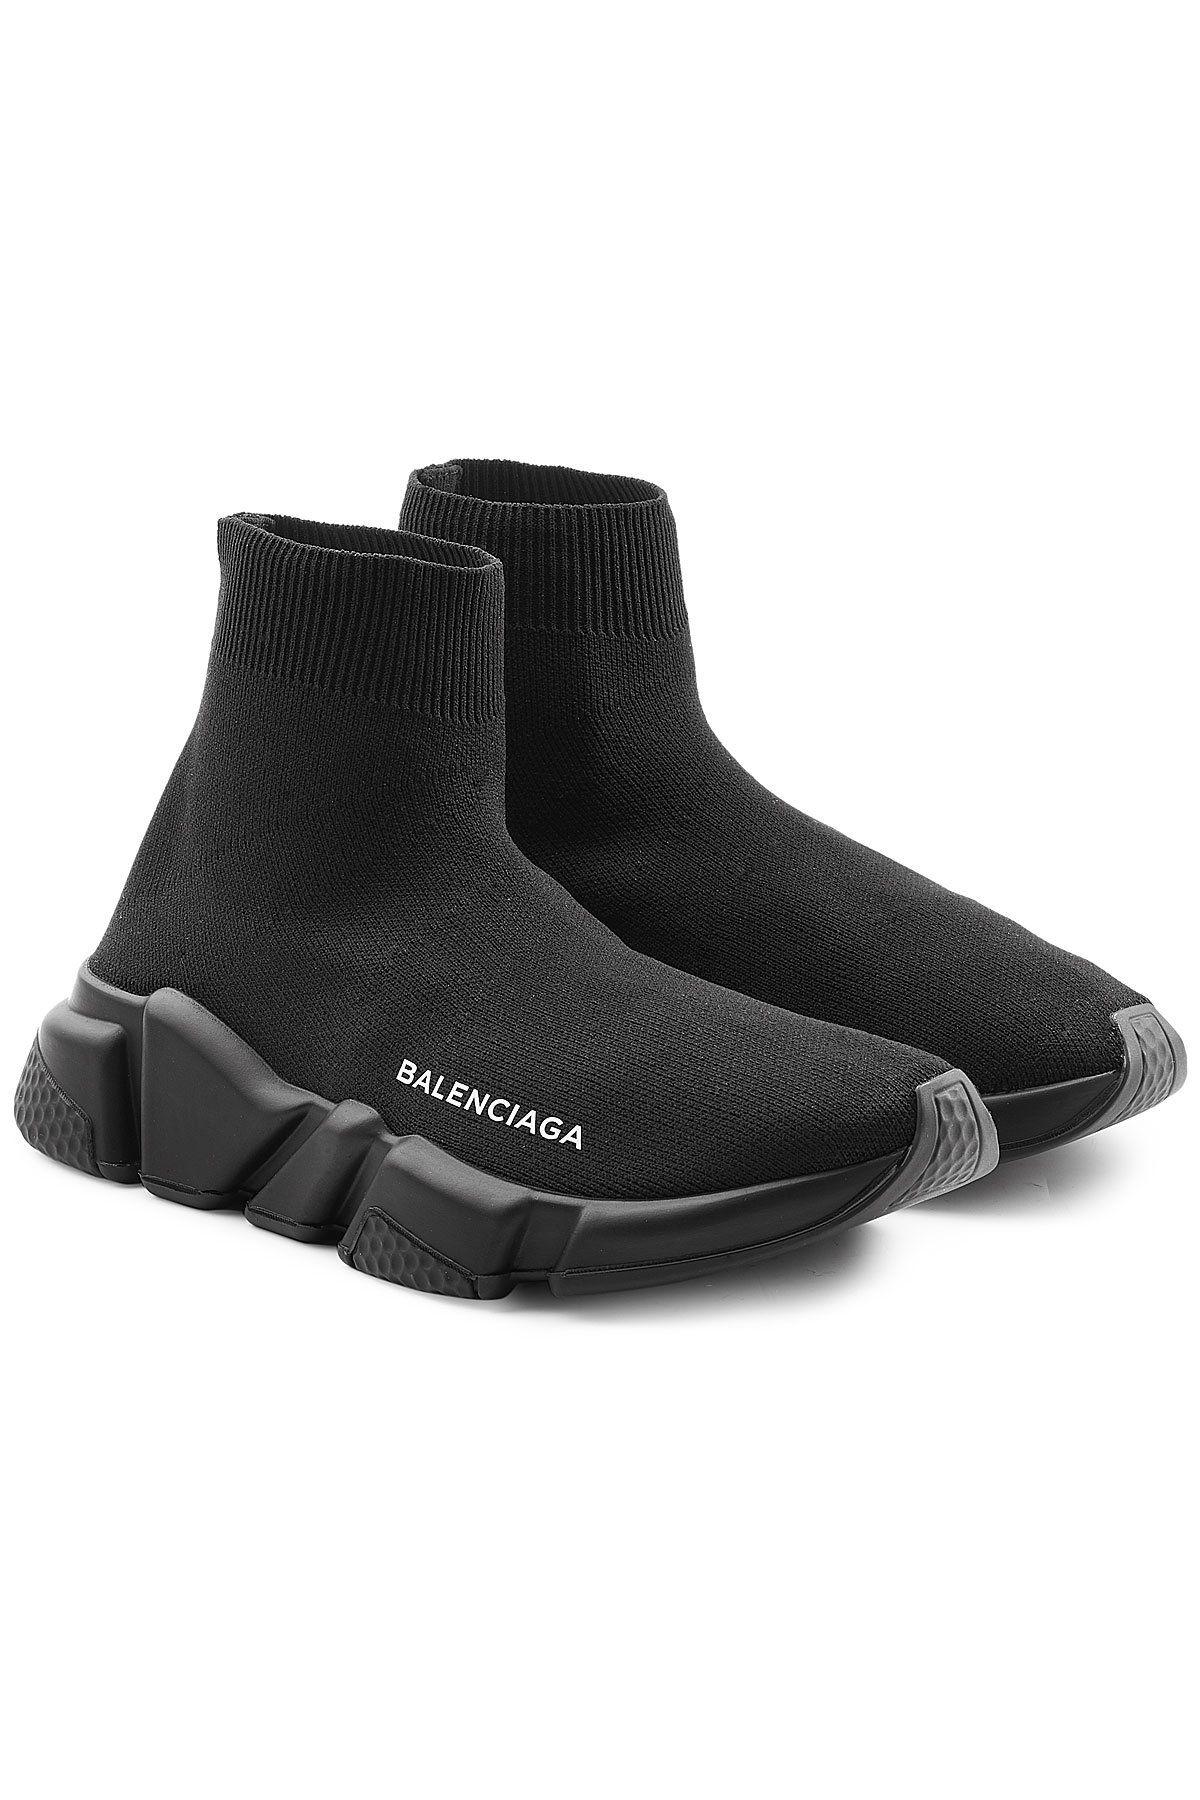 balenciaga sneakers chaussette